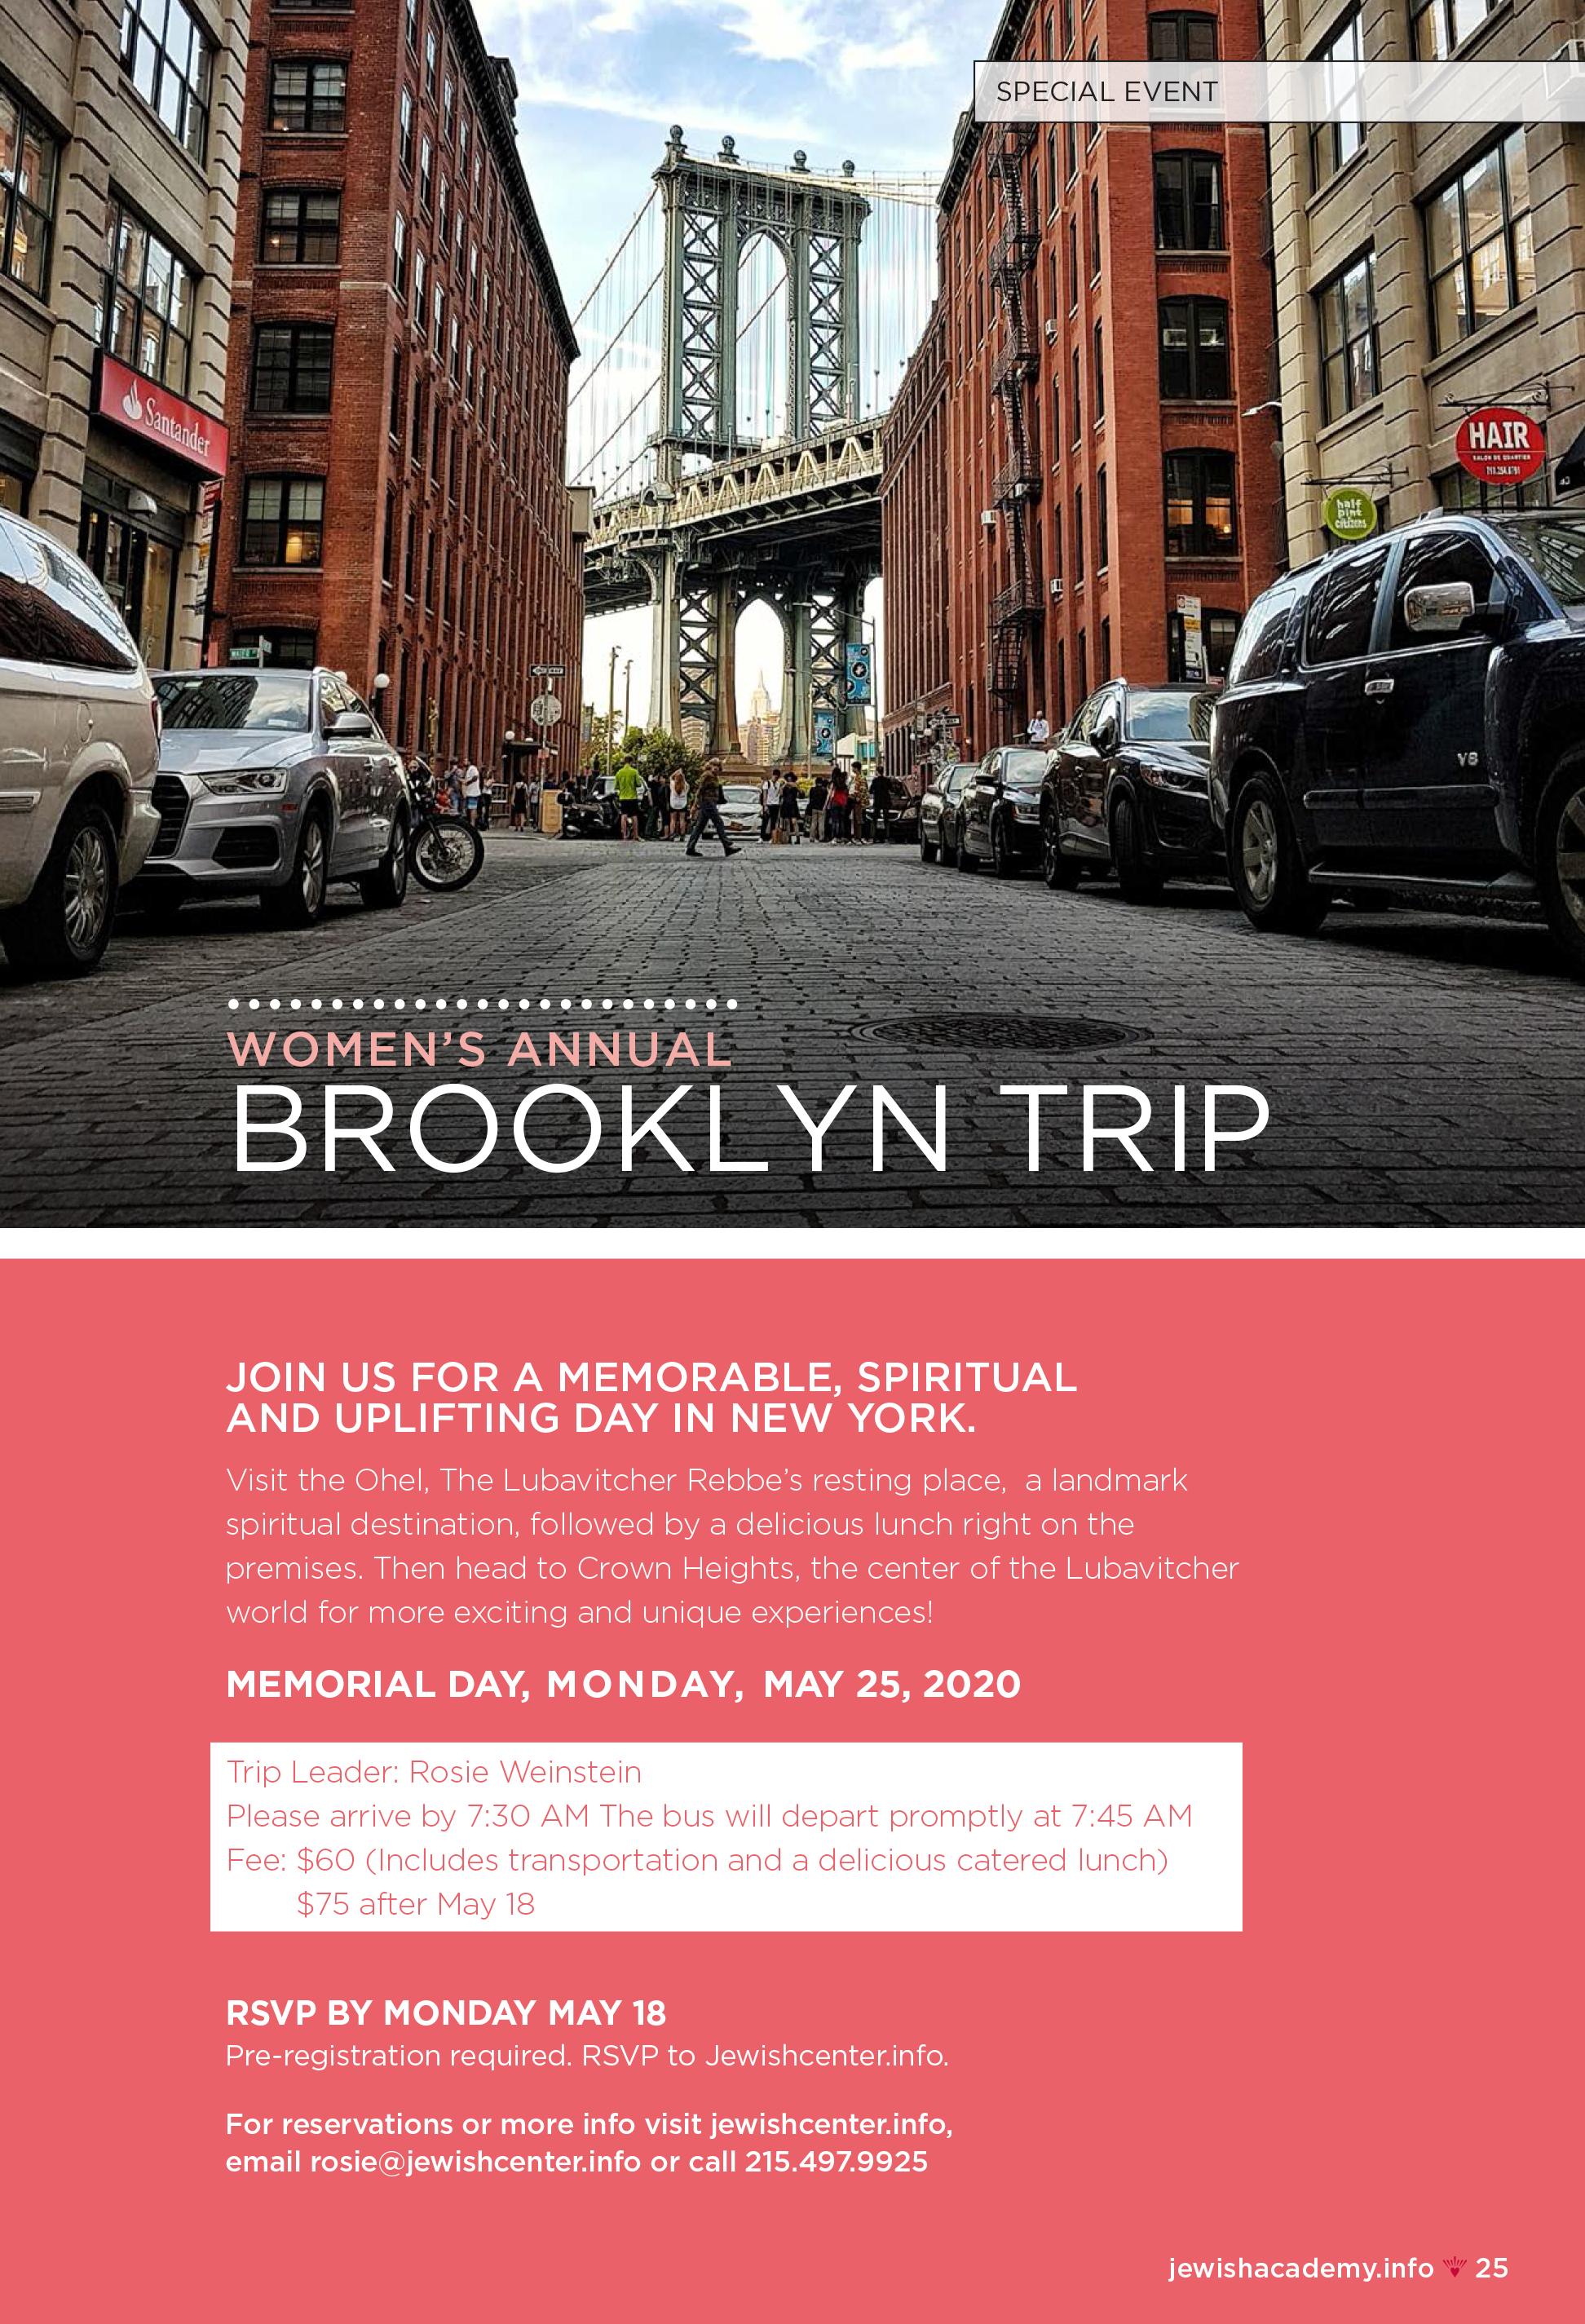 Women's Annual Brooklyn Trip